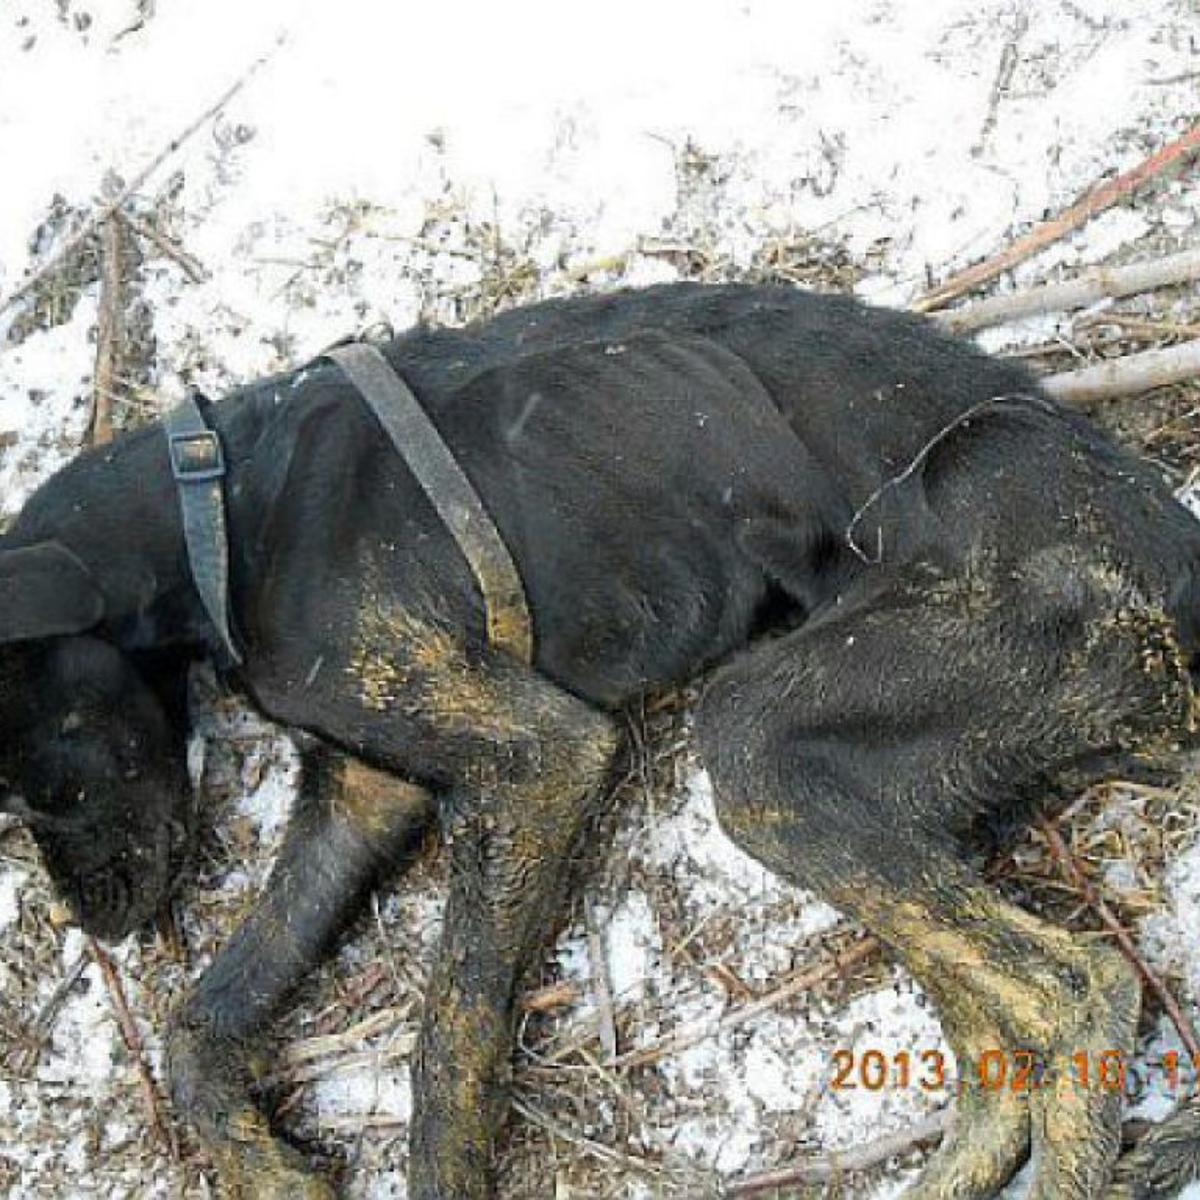 2 more arrests in Waterloo dog death | Local News | qctimes com